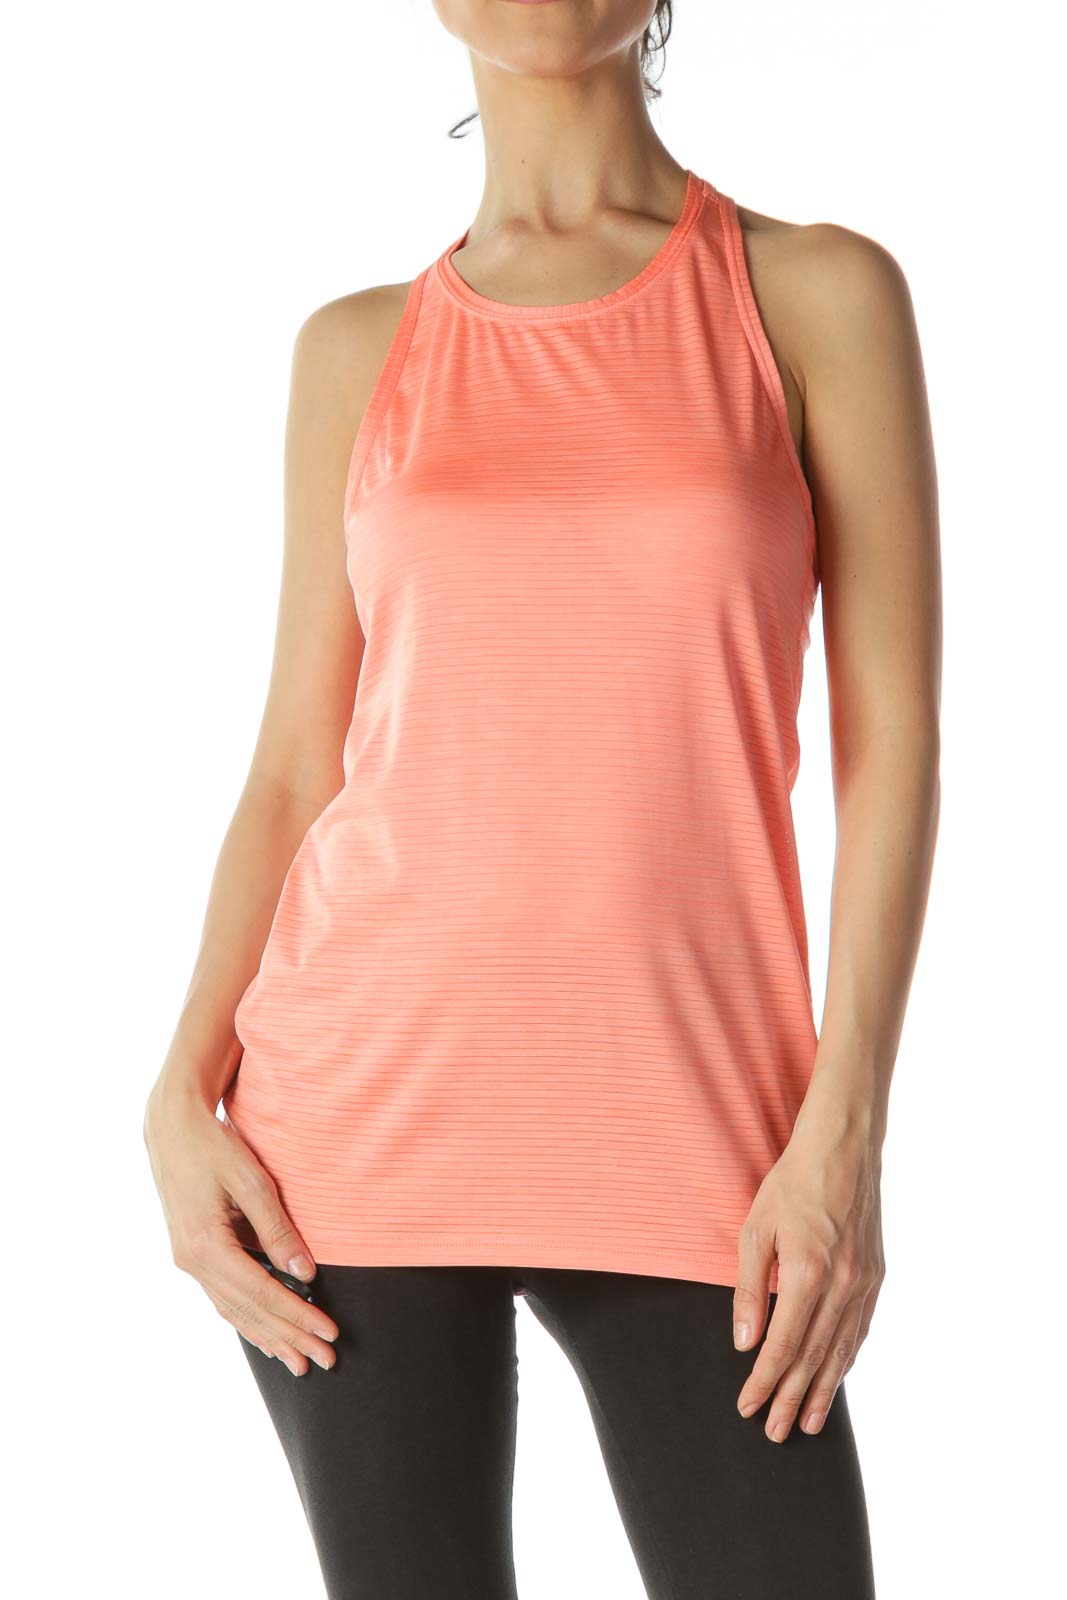 Orange Striped Racerback Yoga Top